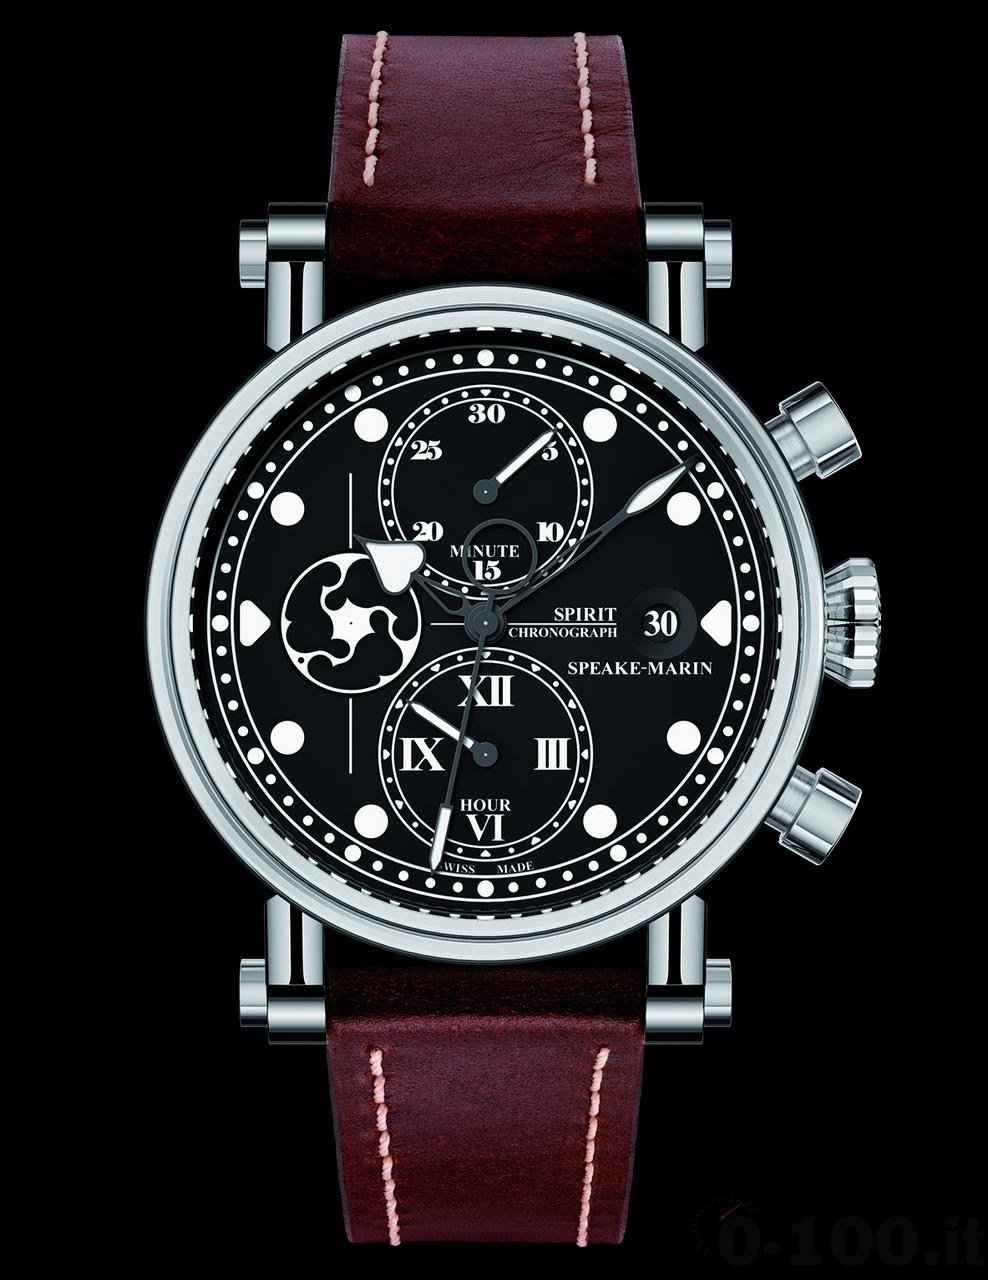 anteprima-baselworld-2014-speake-marin-spirit-seafire-cronograph-prezzo-price_0-1001